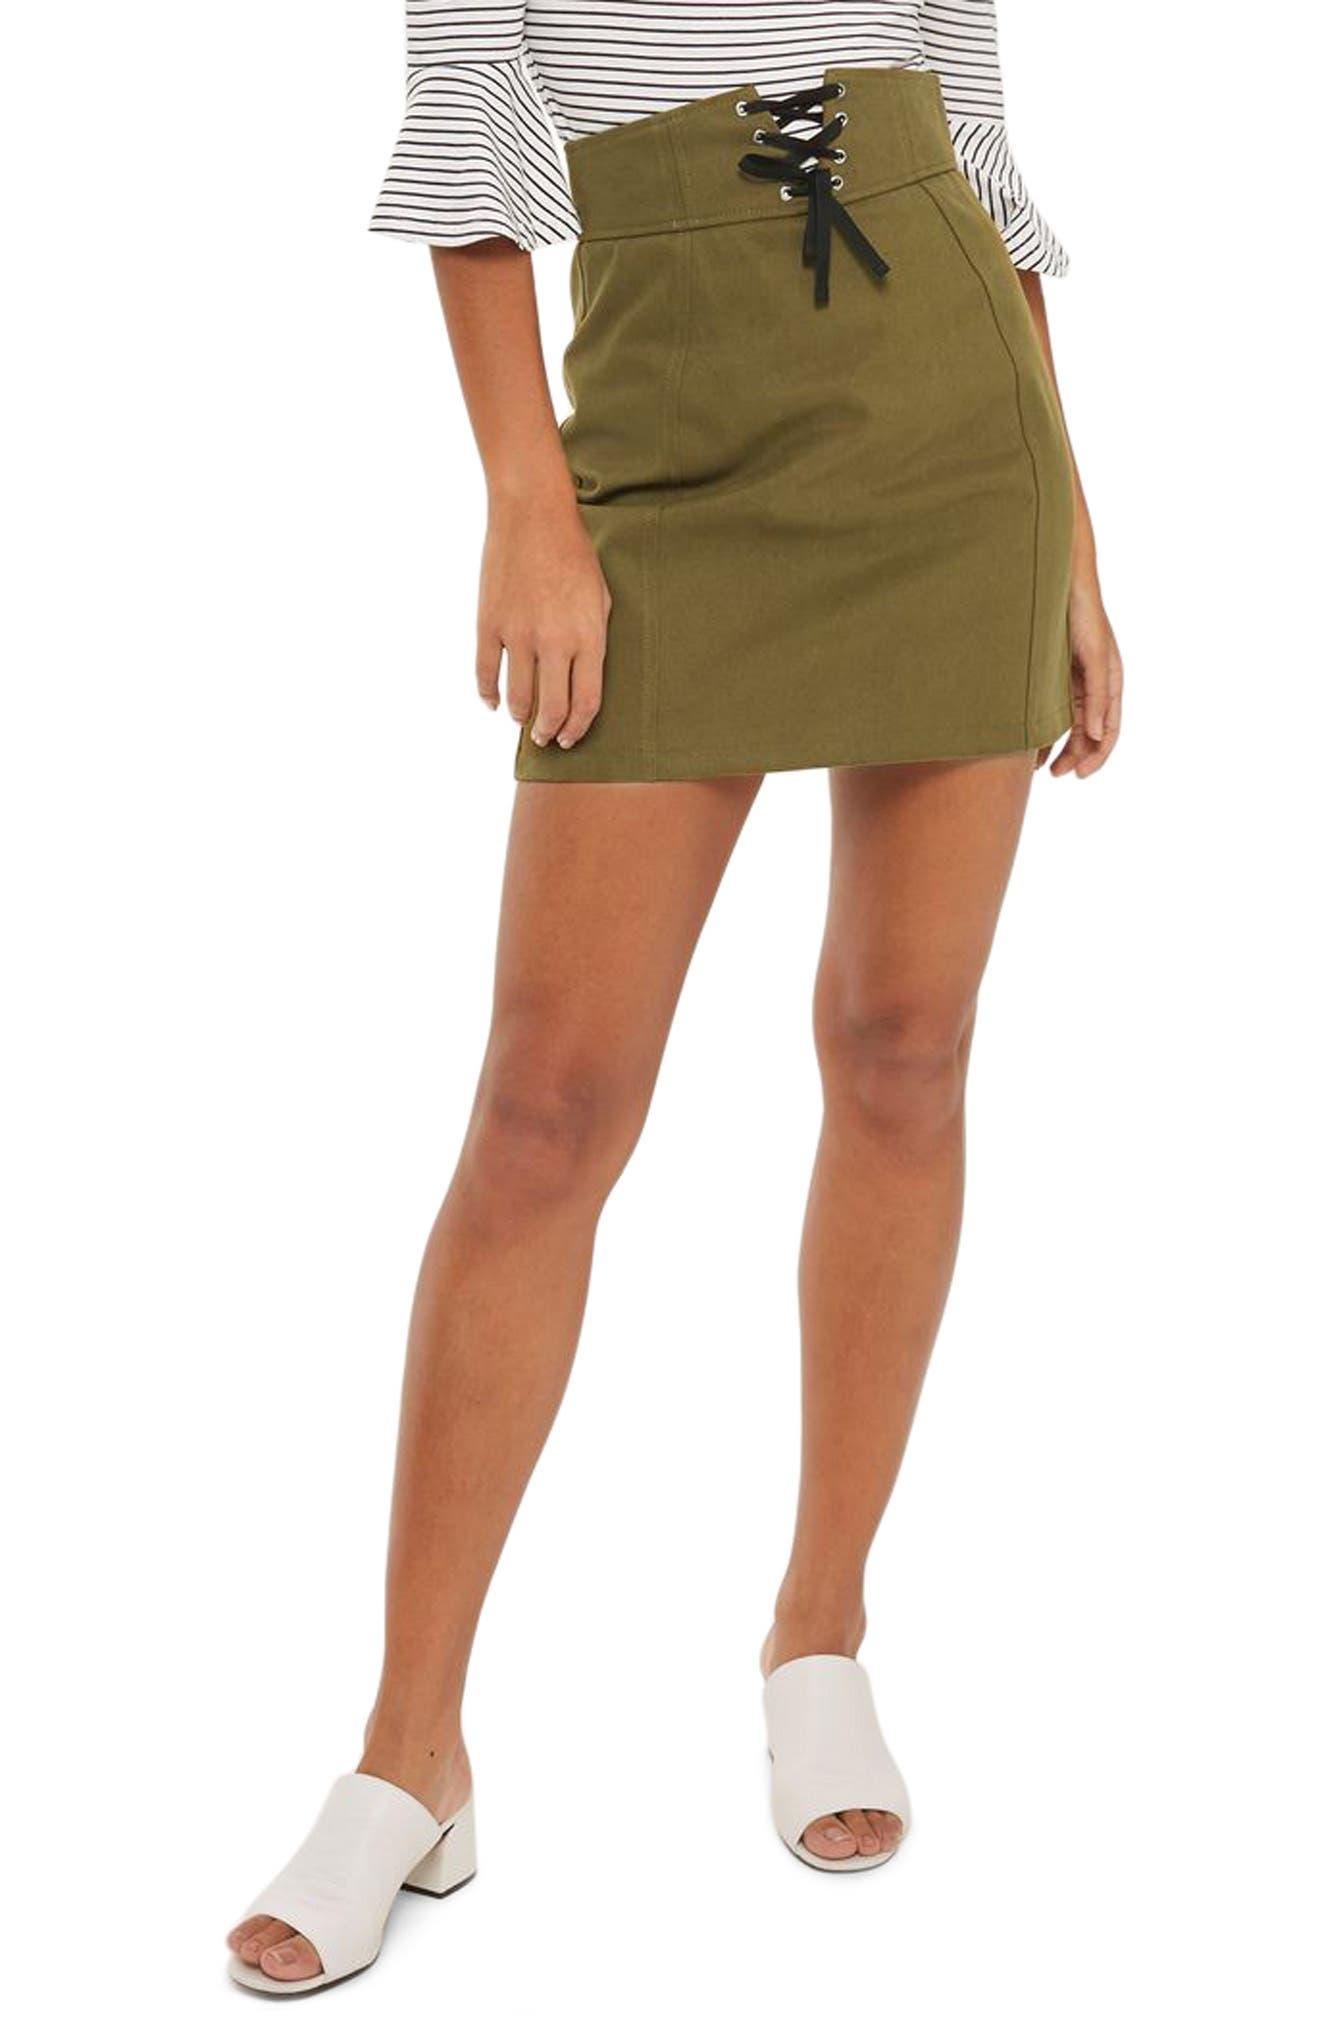 Main Image - Topshop Corset Lace-Up Skirt